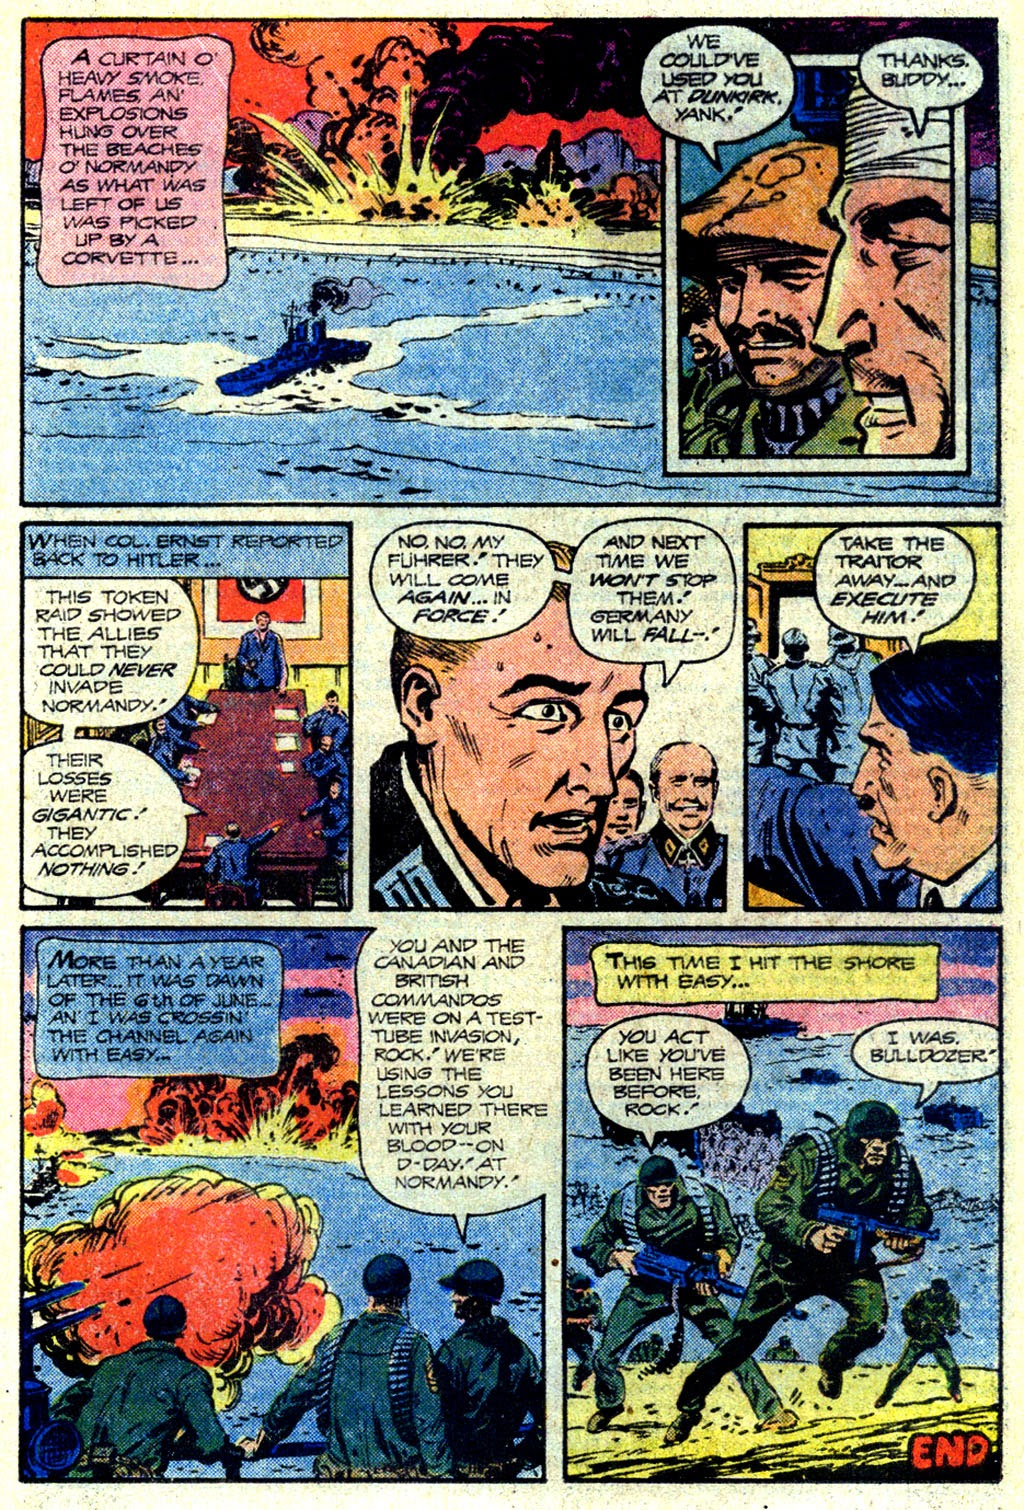 Read online Sgt. Rock comic -  Issue #339 - 13